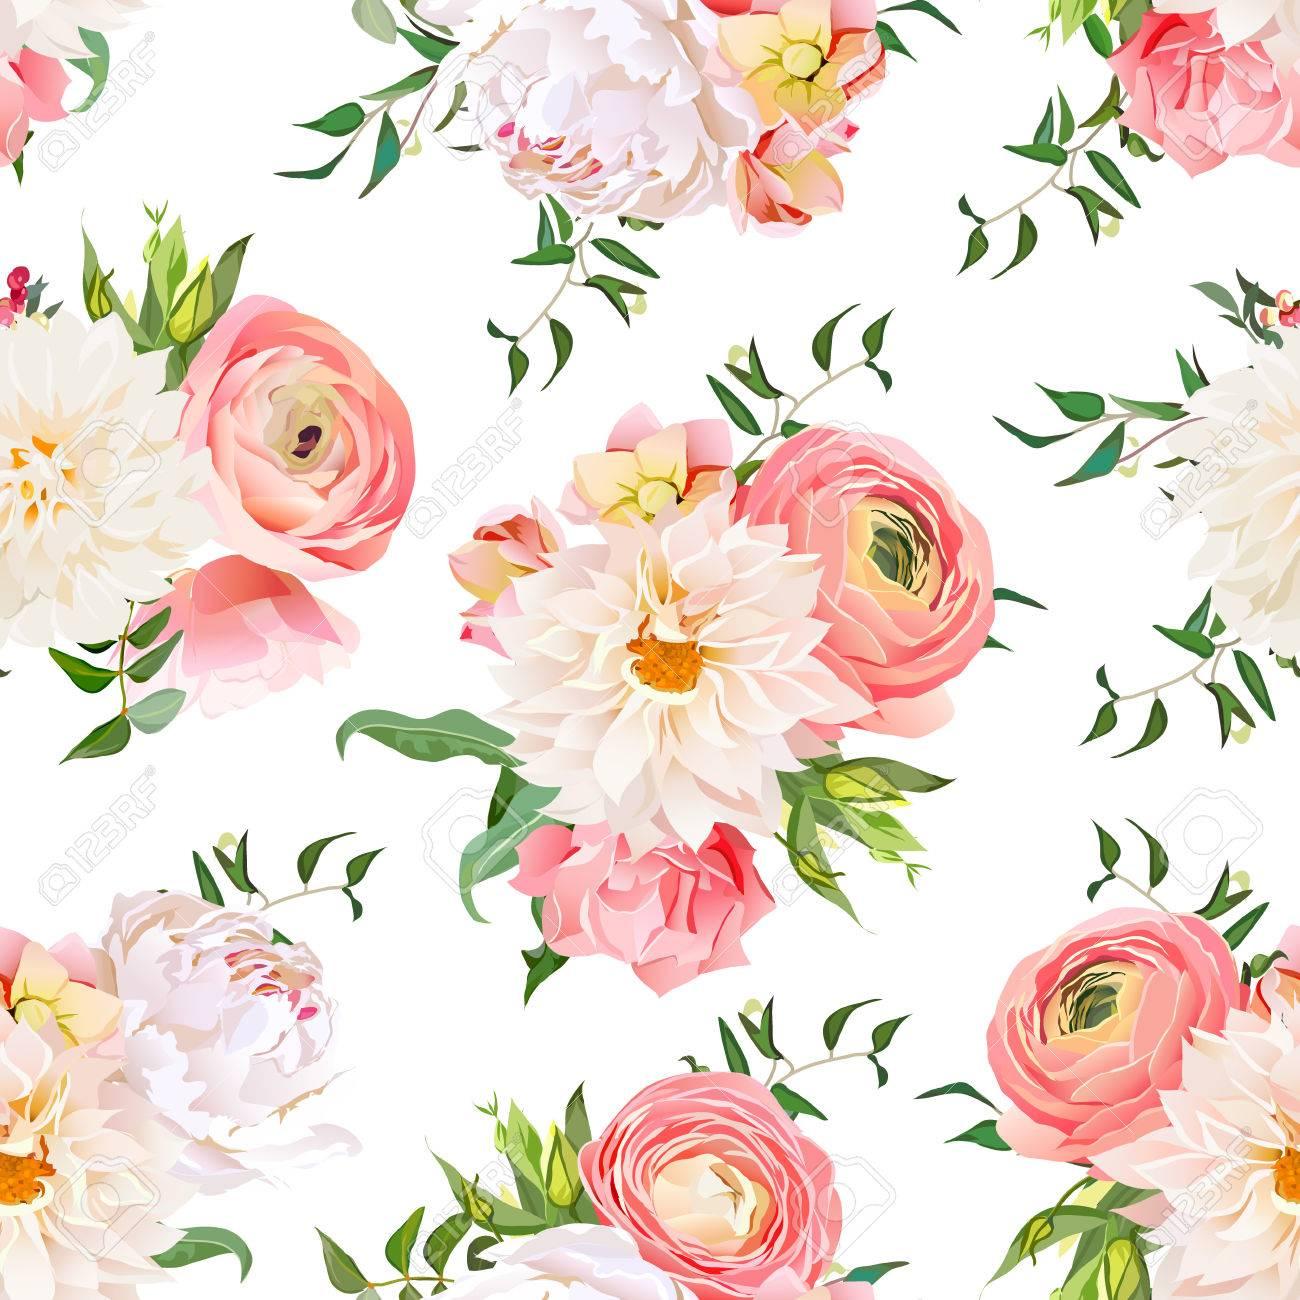 Garden Rose And Peony dahlia, ranunculus, rose and peony seamless pattern. romantic